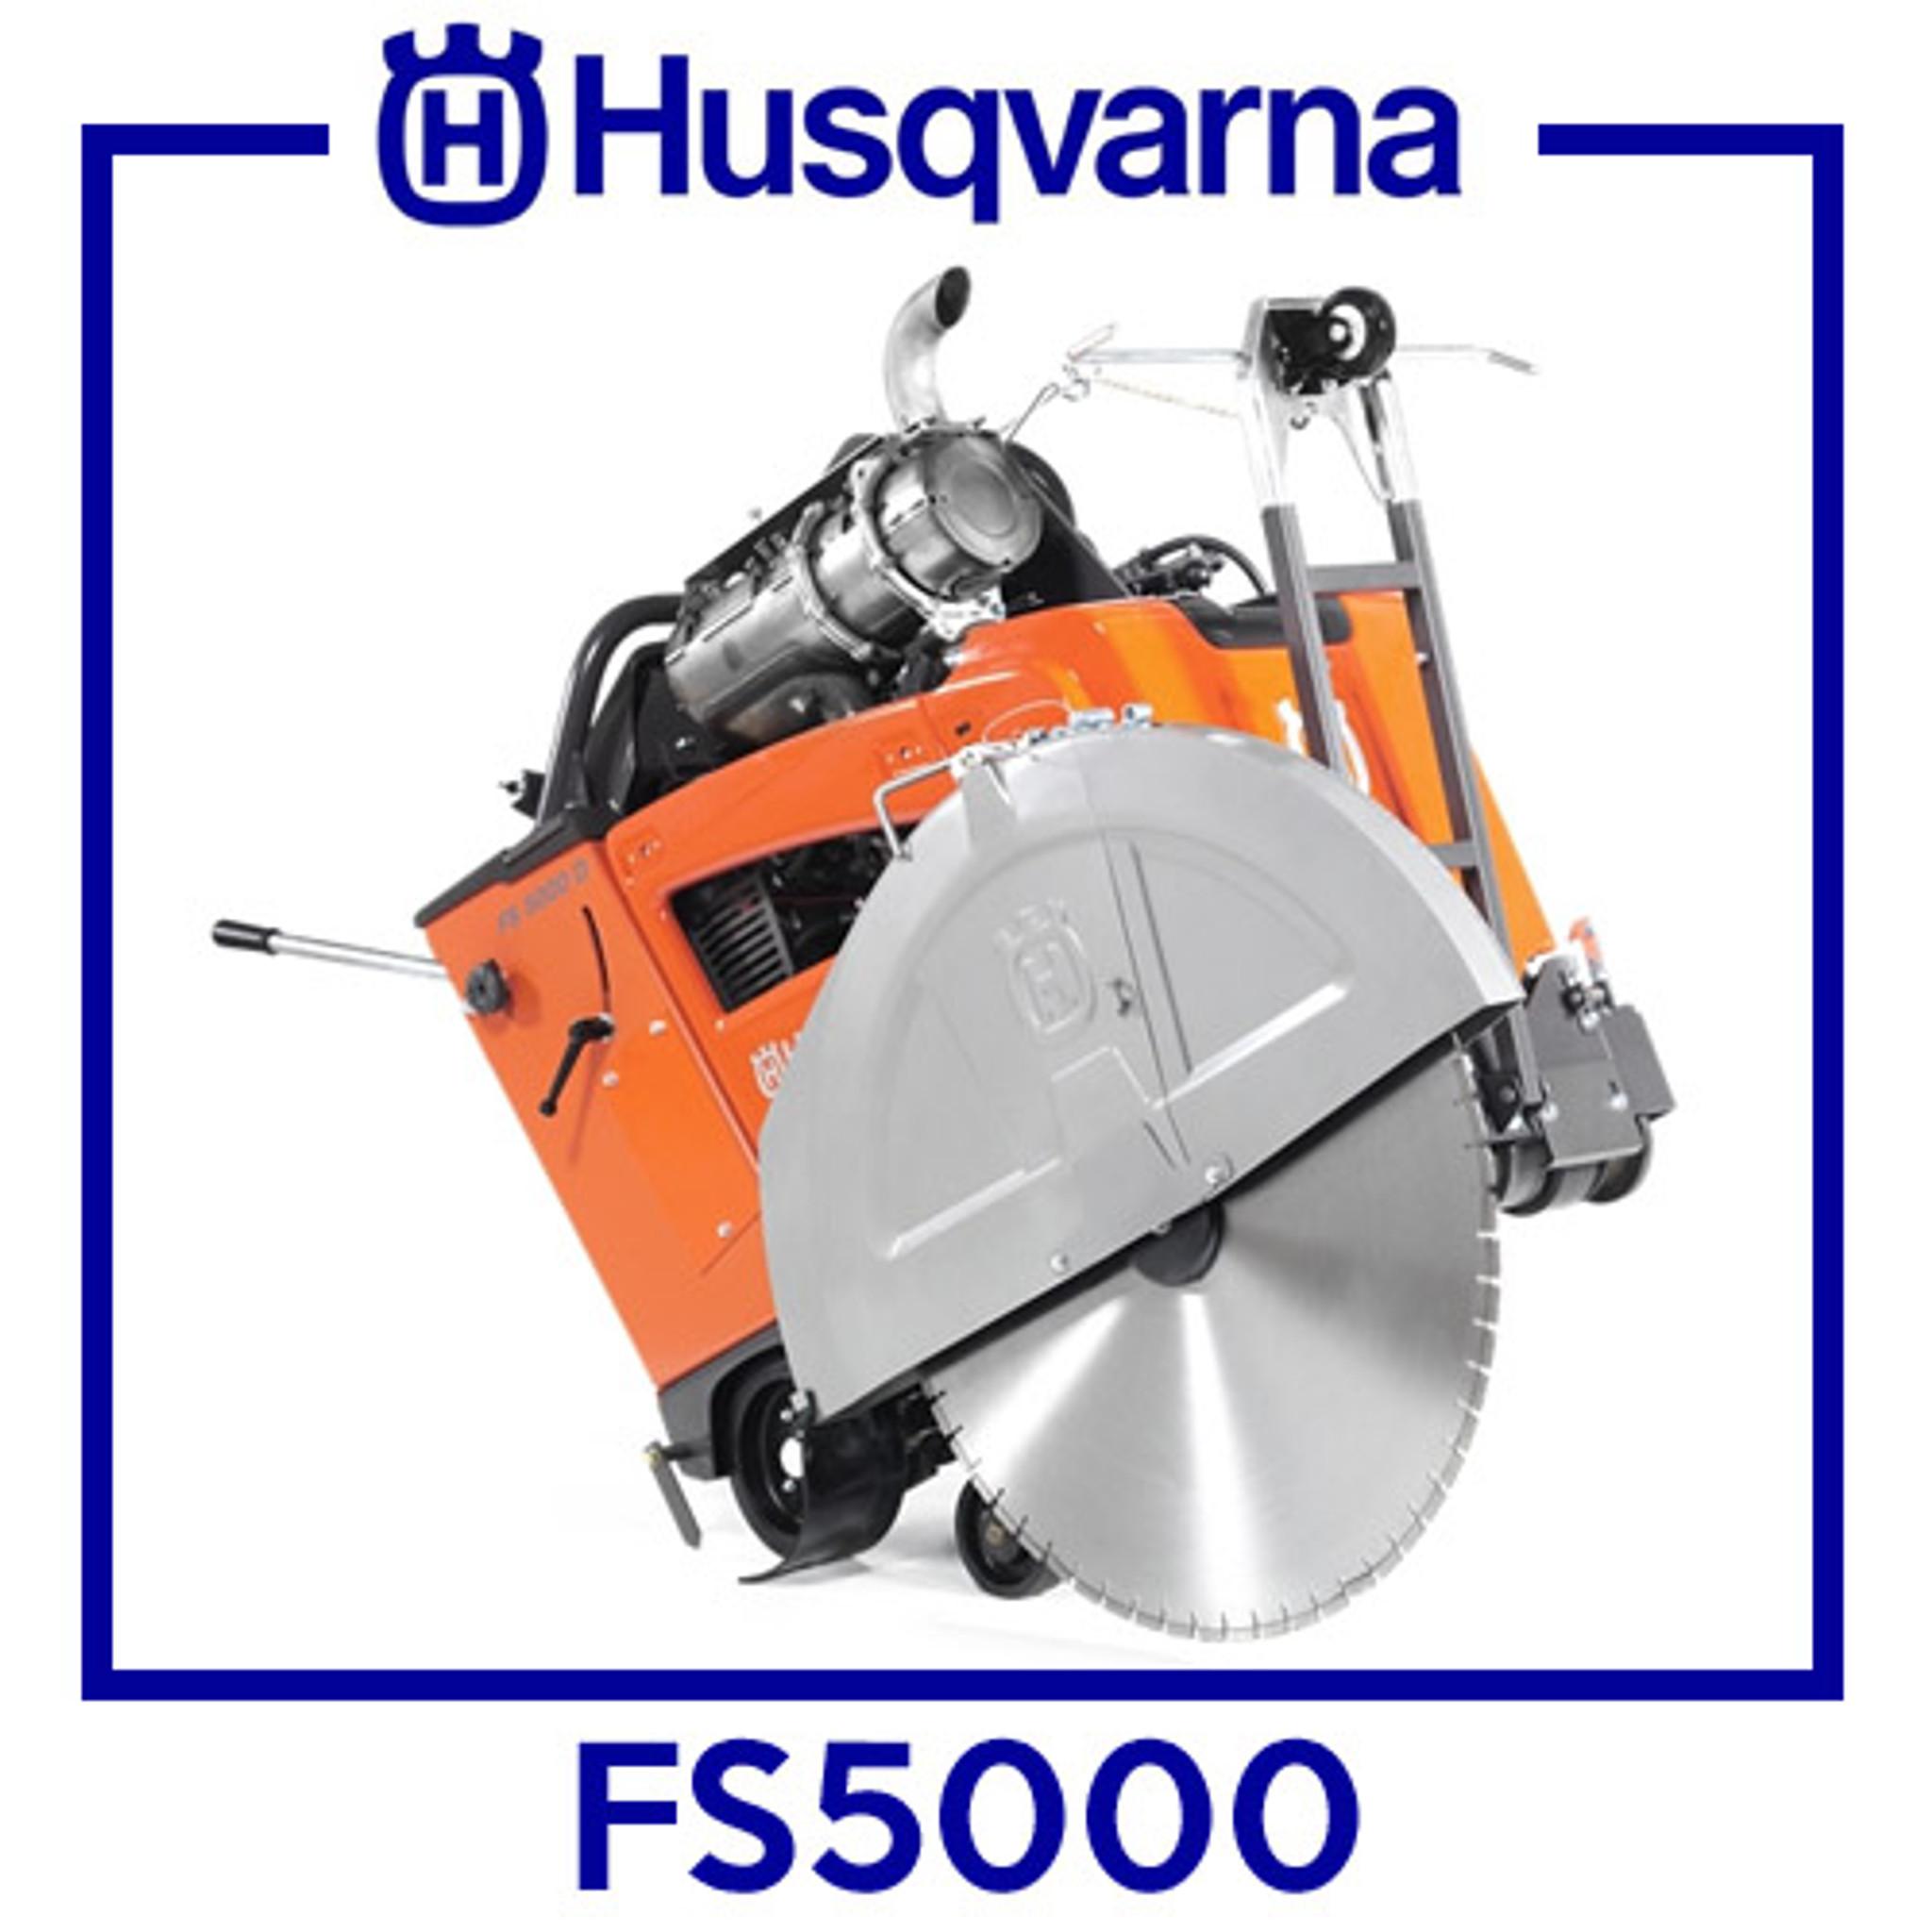 V-Belt: 3Vx450 - 3 Band   Husqvarna FS5000   505777401